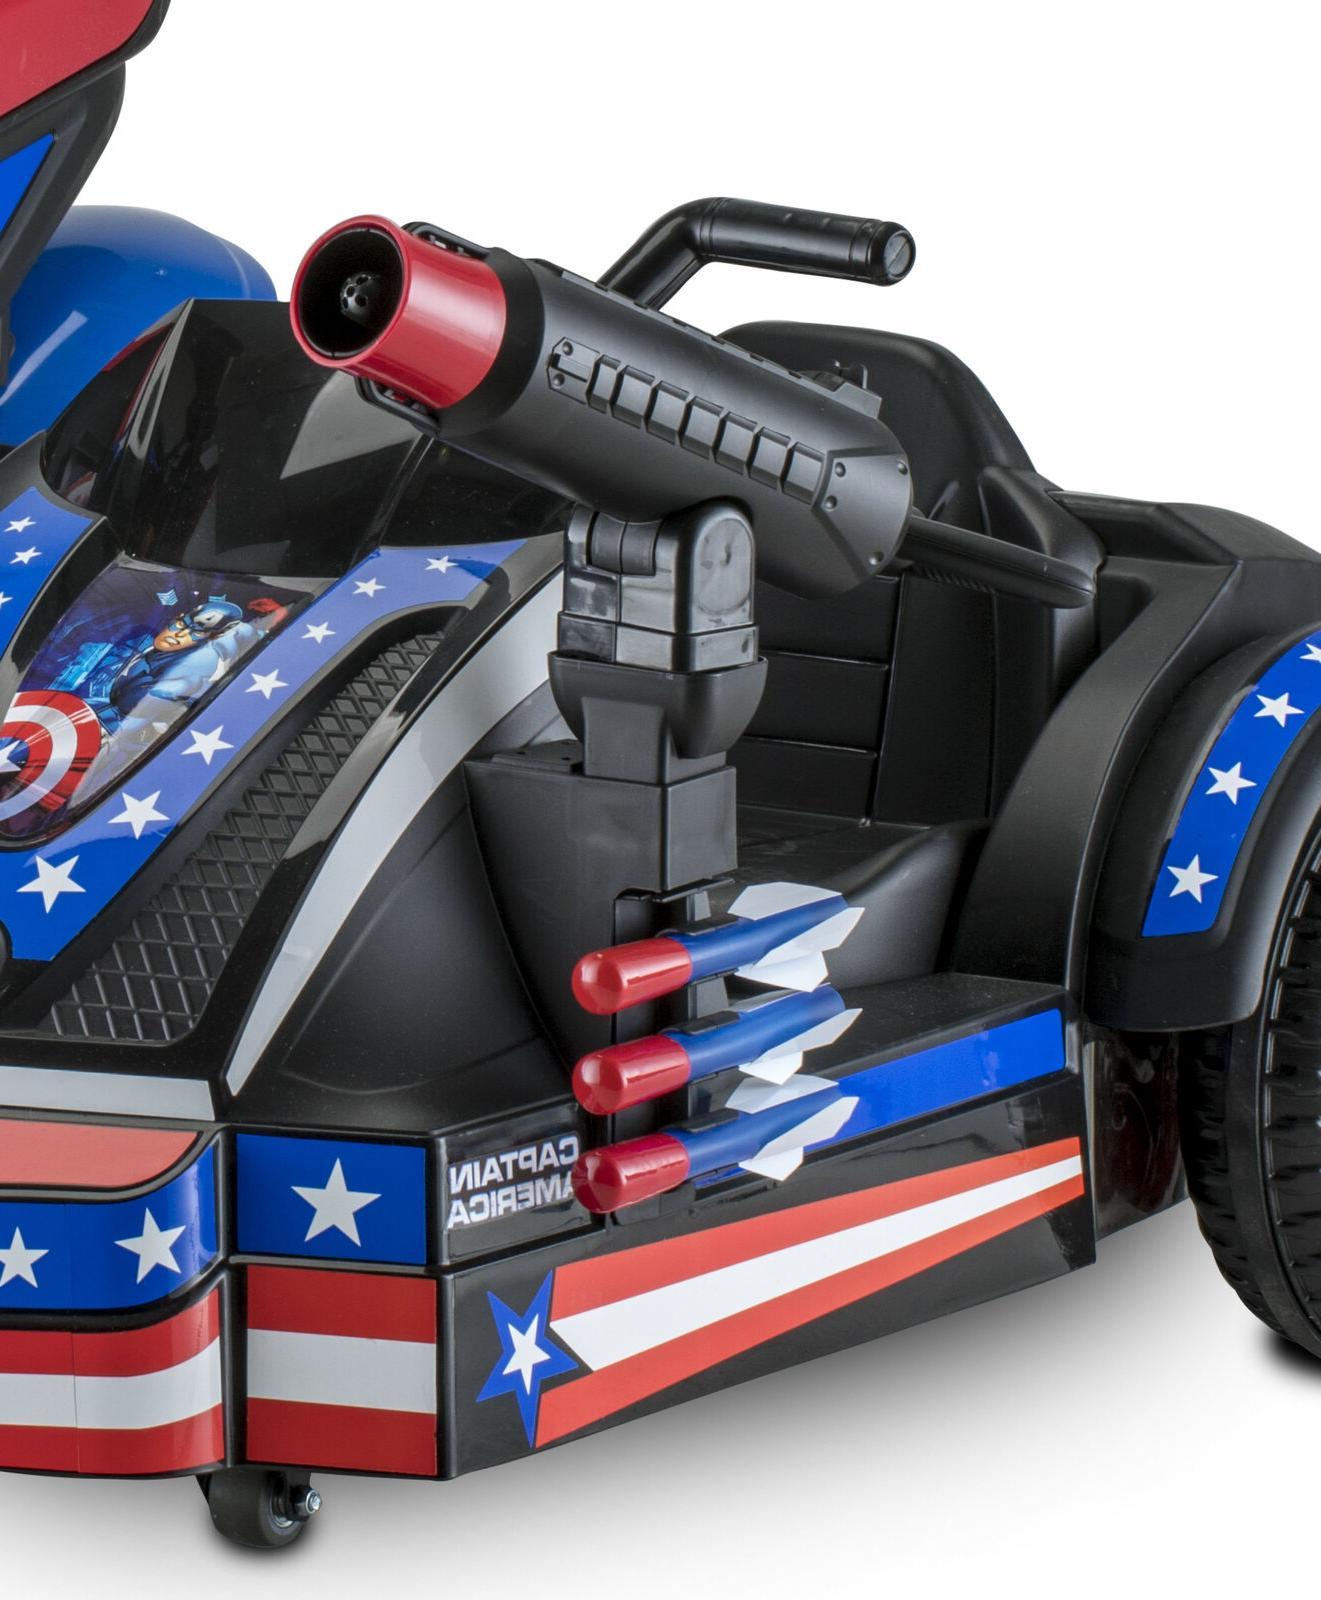 Captain Sidecar Kid Ride-On Toy Sidewalk